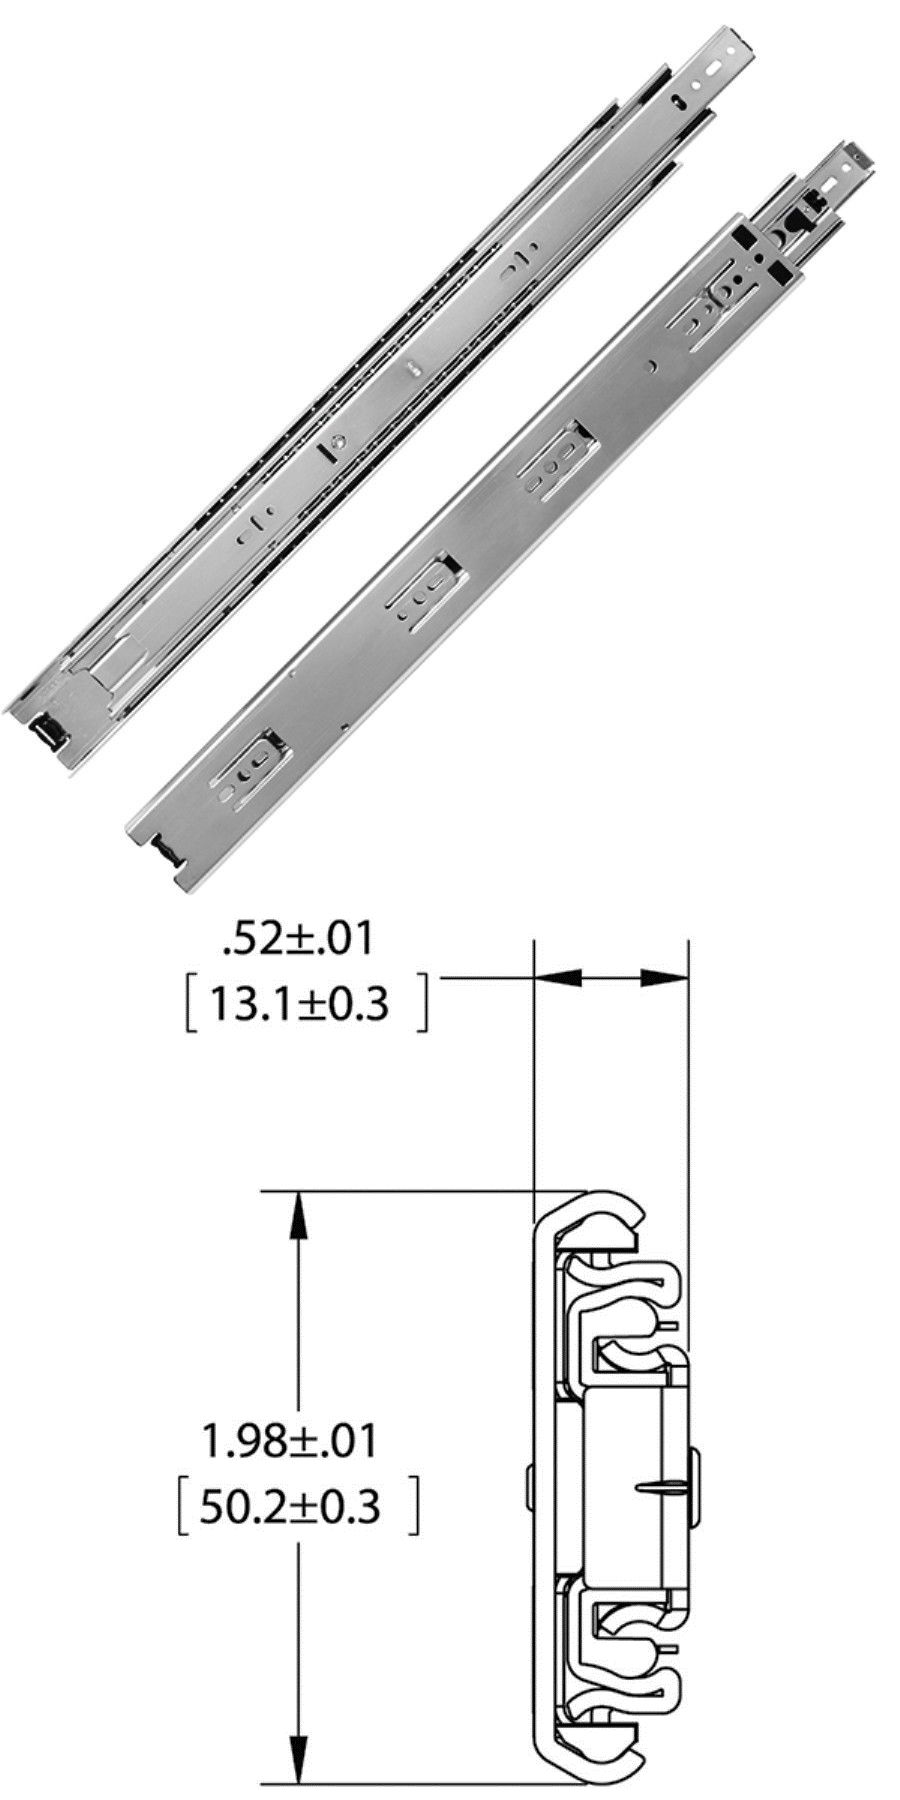 Details About Kv Full Extension 150lb Drawer Slide Kv8600 Precision Ball Bearing Side Mount Drawer Slides Slide Drawers